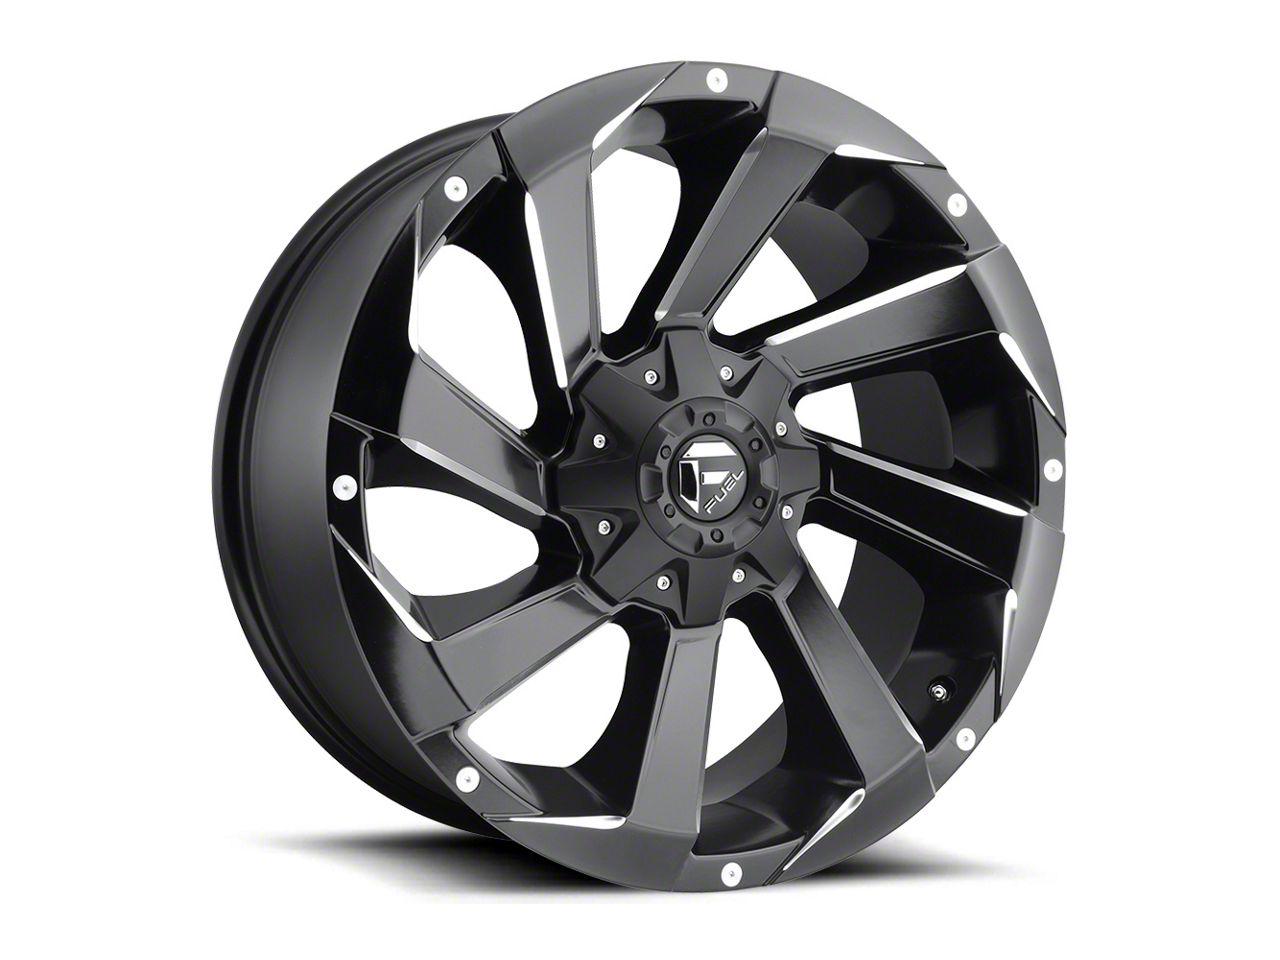 Fuel Wheels Razor Matte Black Milled 6-Lug Wheel - 20x9 (04-18 F-150)